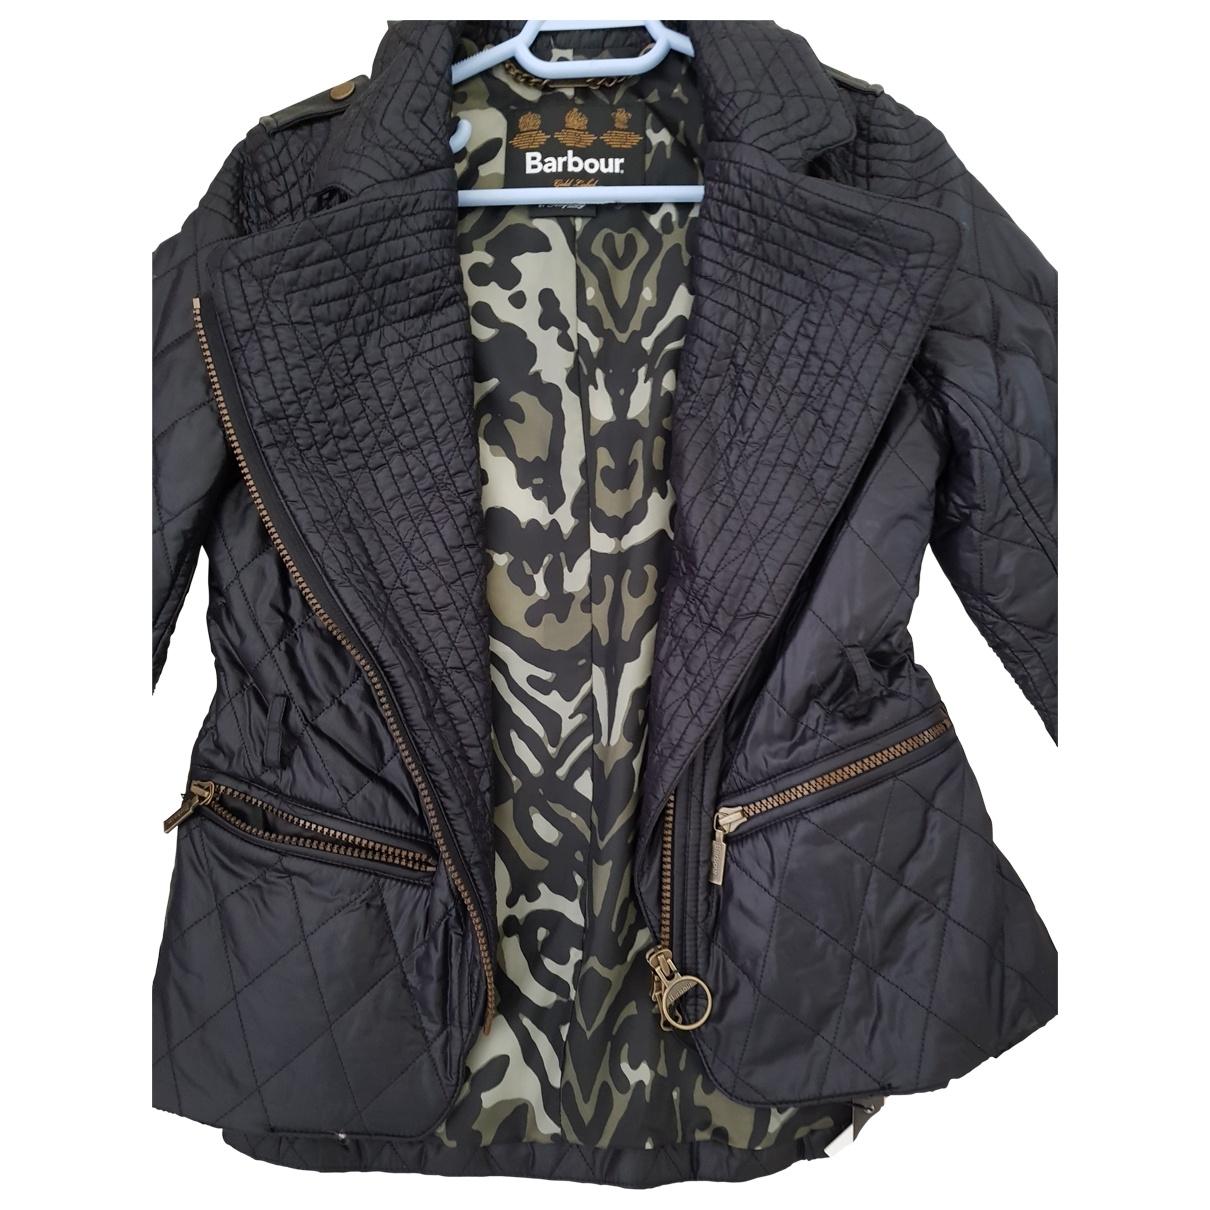 Barbour \N Black jacket for Women 10 UK